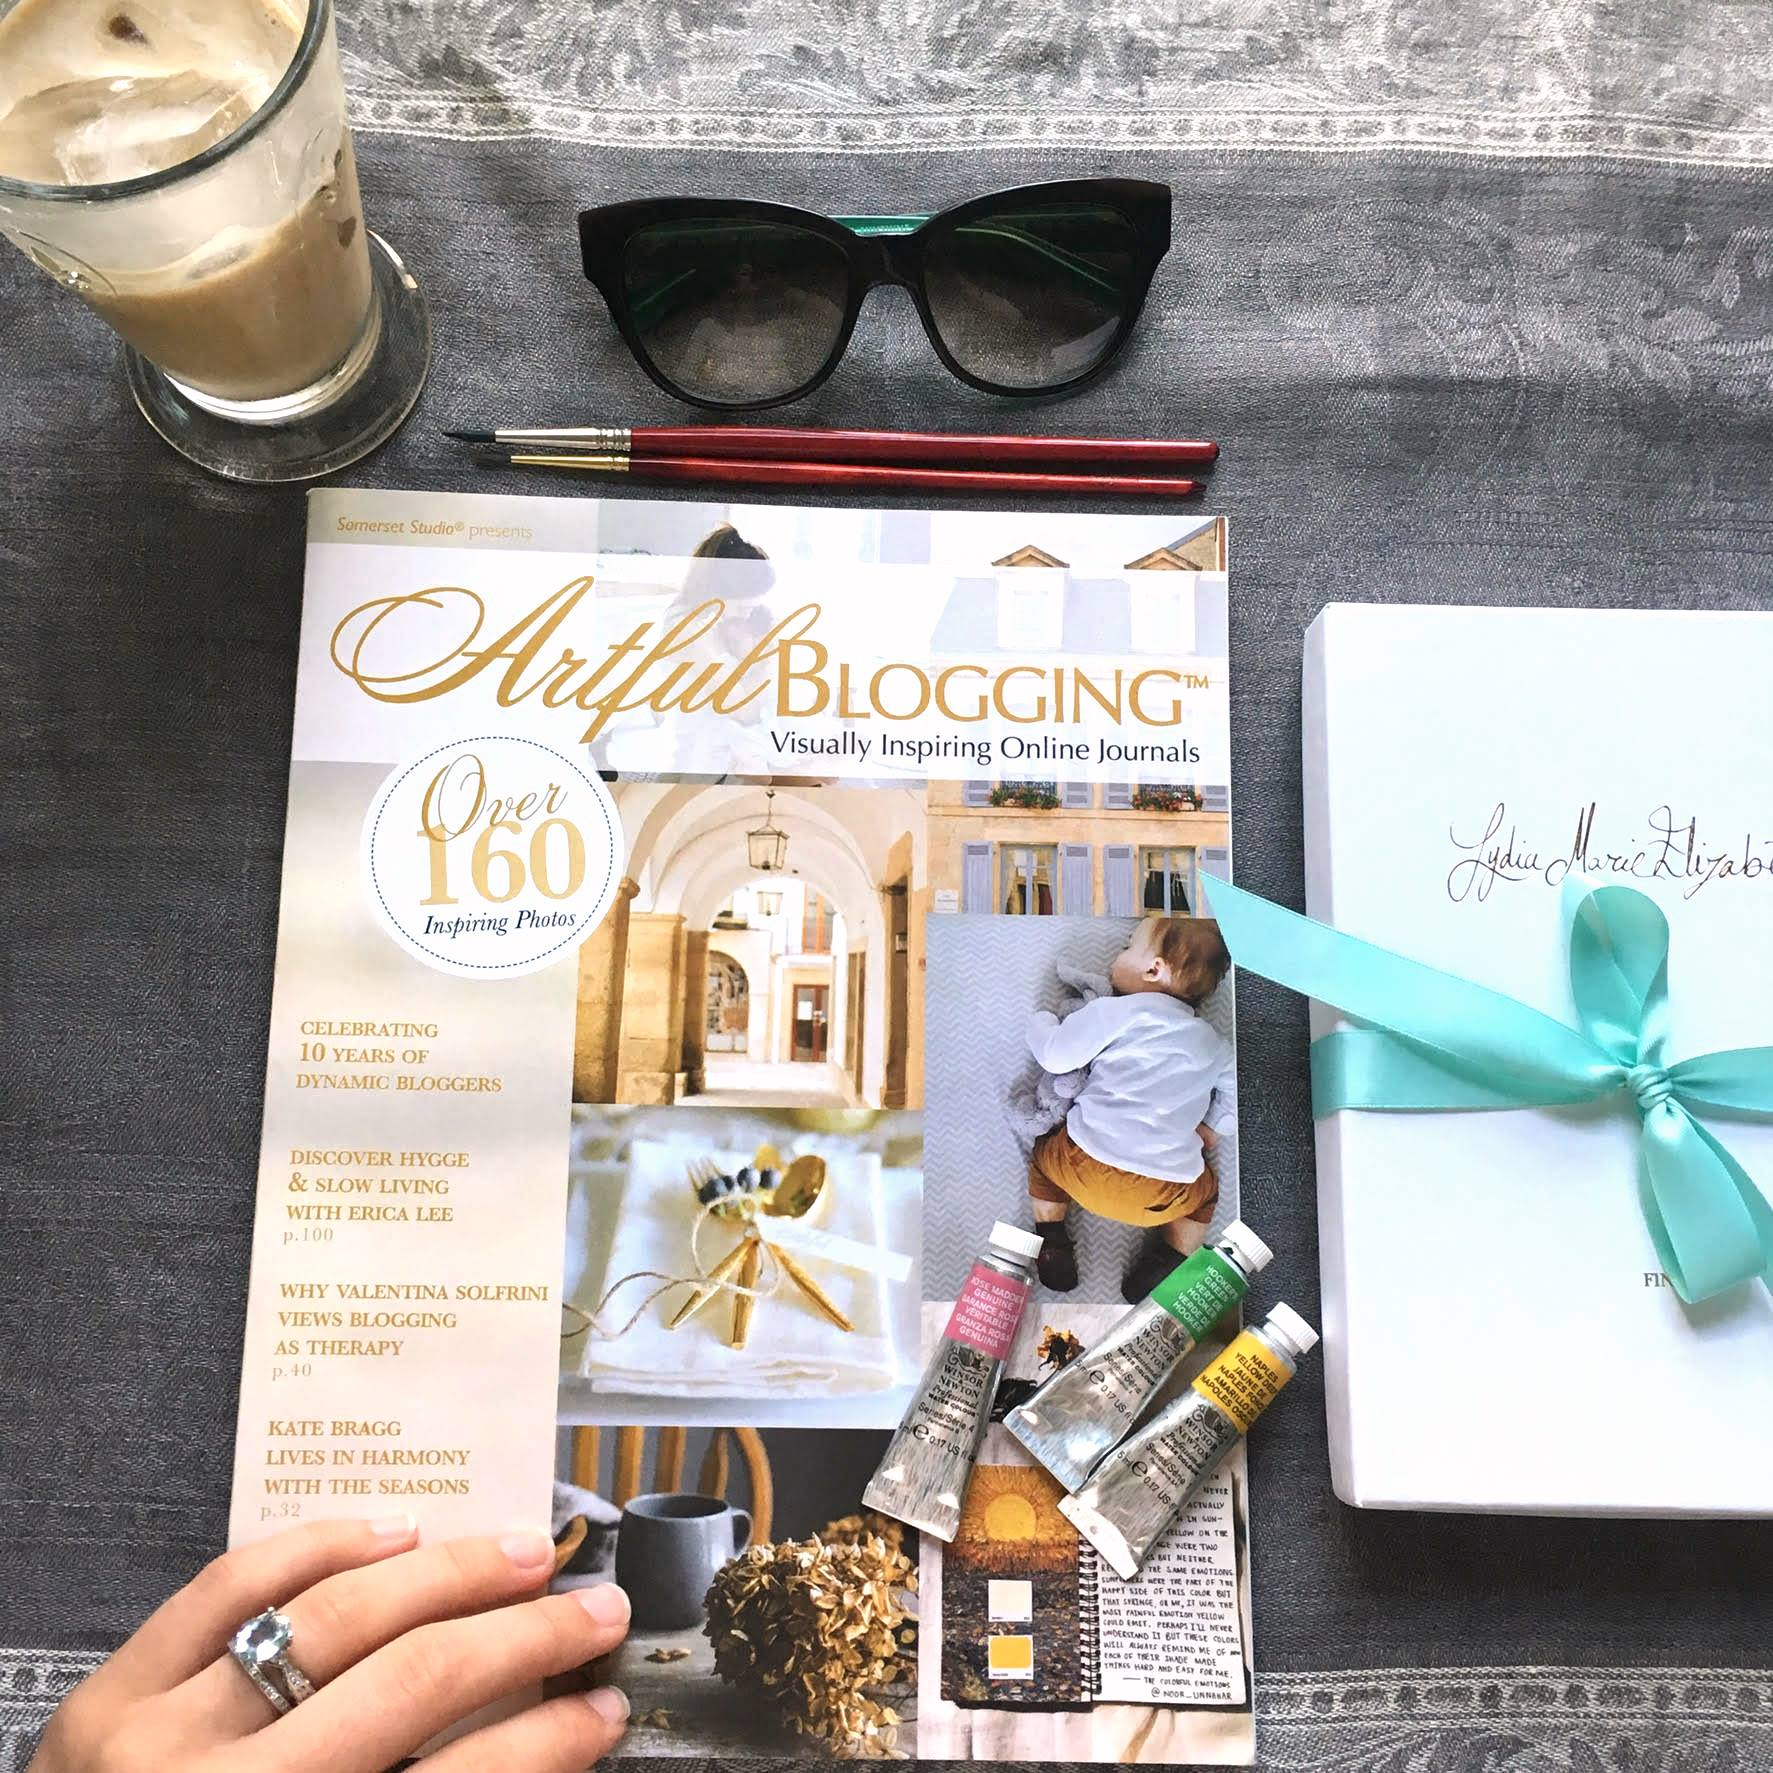 Lydia Marie Elizabeth featured in Stampington & Company's Artful Blogging Magazine (2).jpg